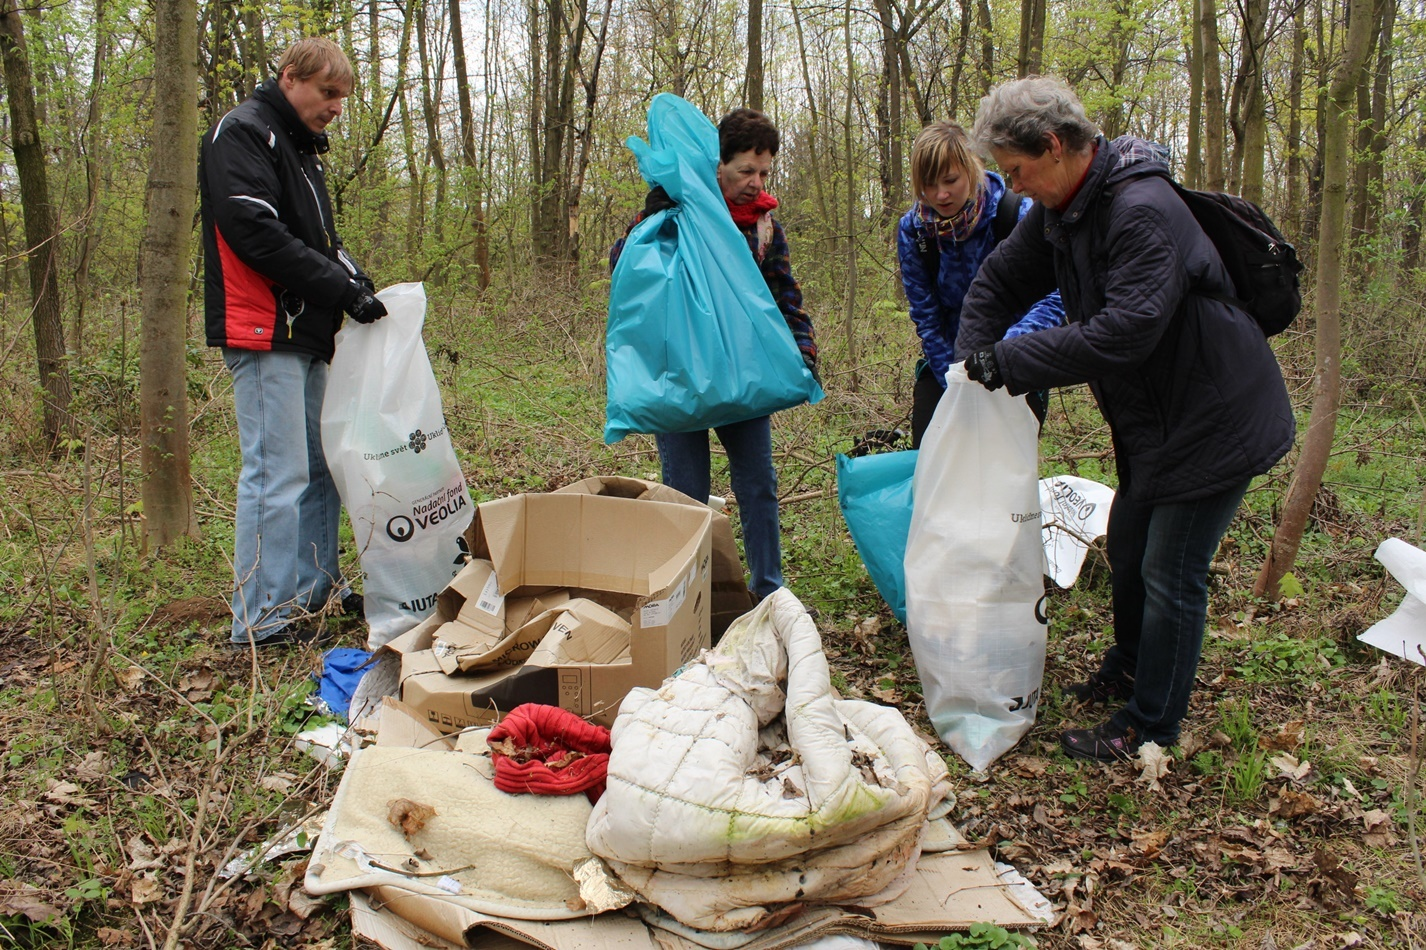 Dobrovolníci uklidí Česko. Loni se jich zapojilo skoro sto tisíc